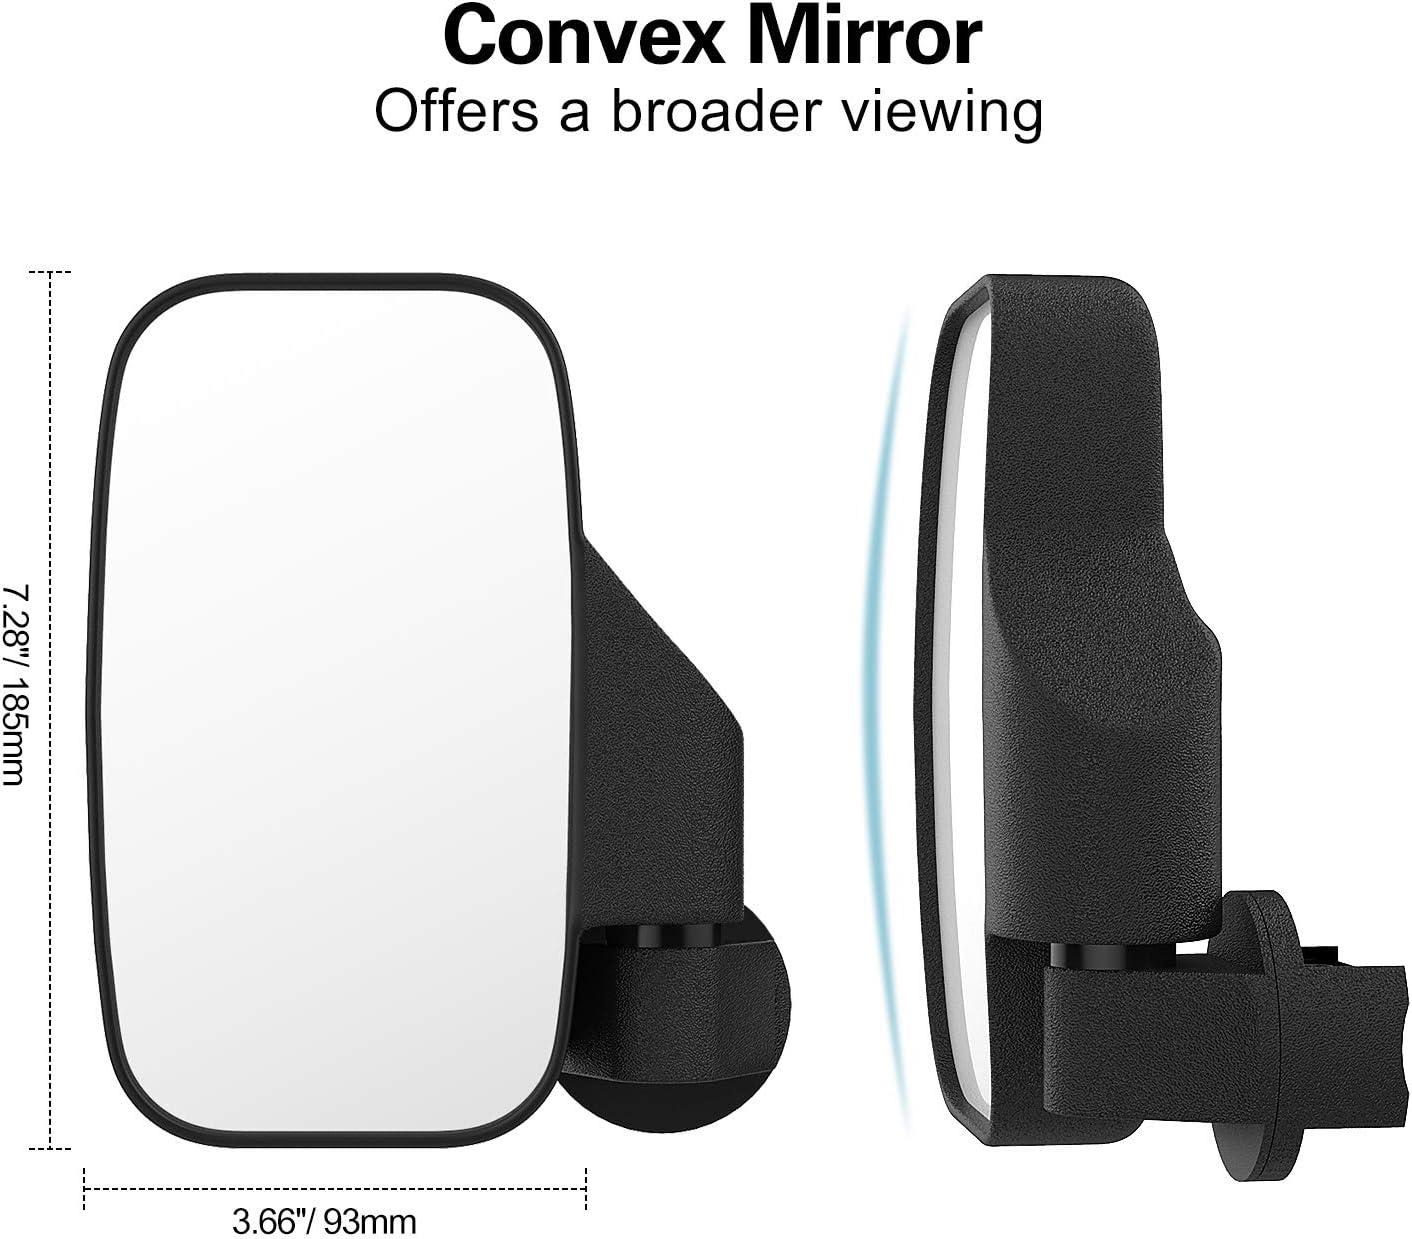 MoKo 2Pack Shatterproof Side Convex All-Terrain Vehicle UTV Rear Rearview Mirror